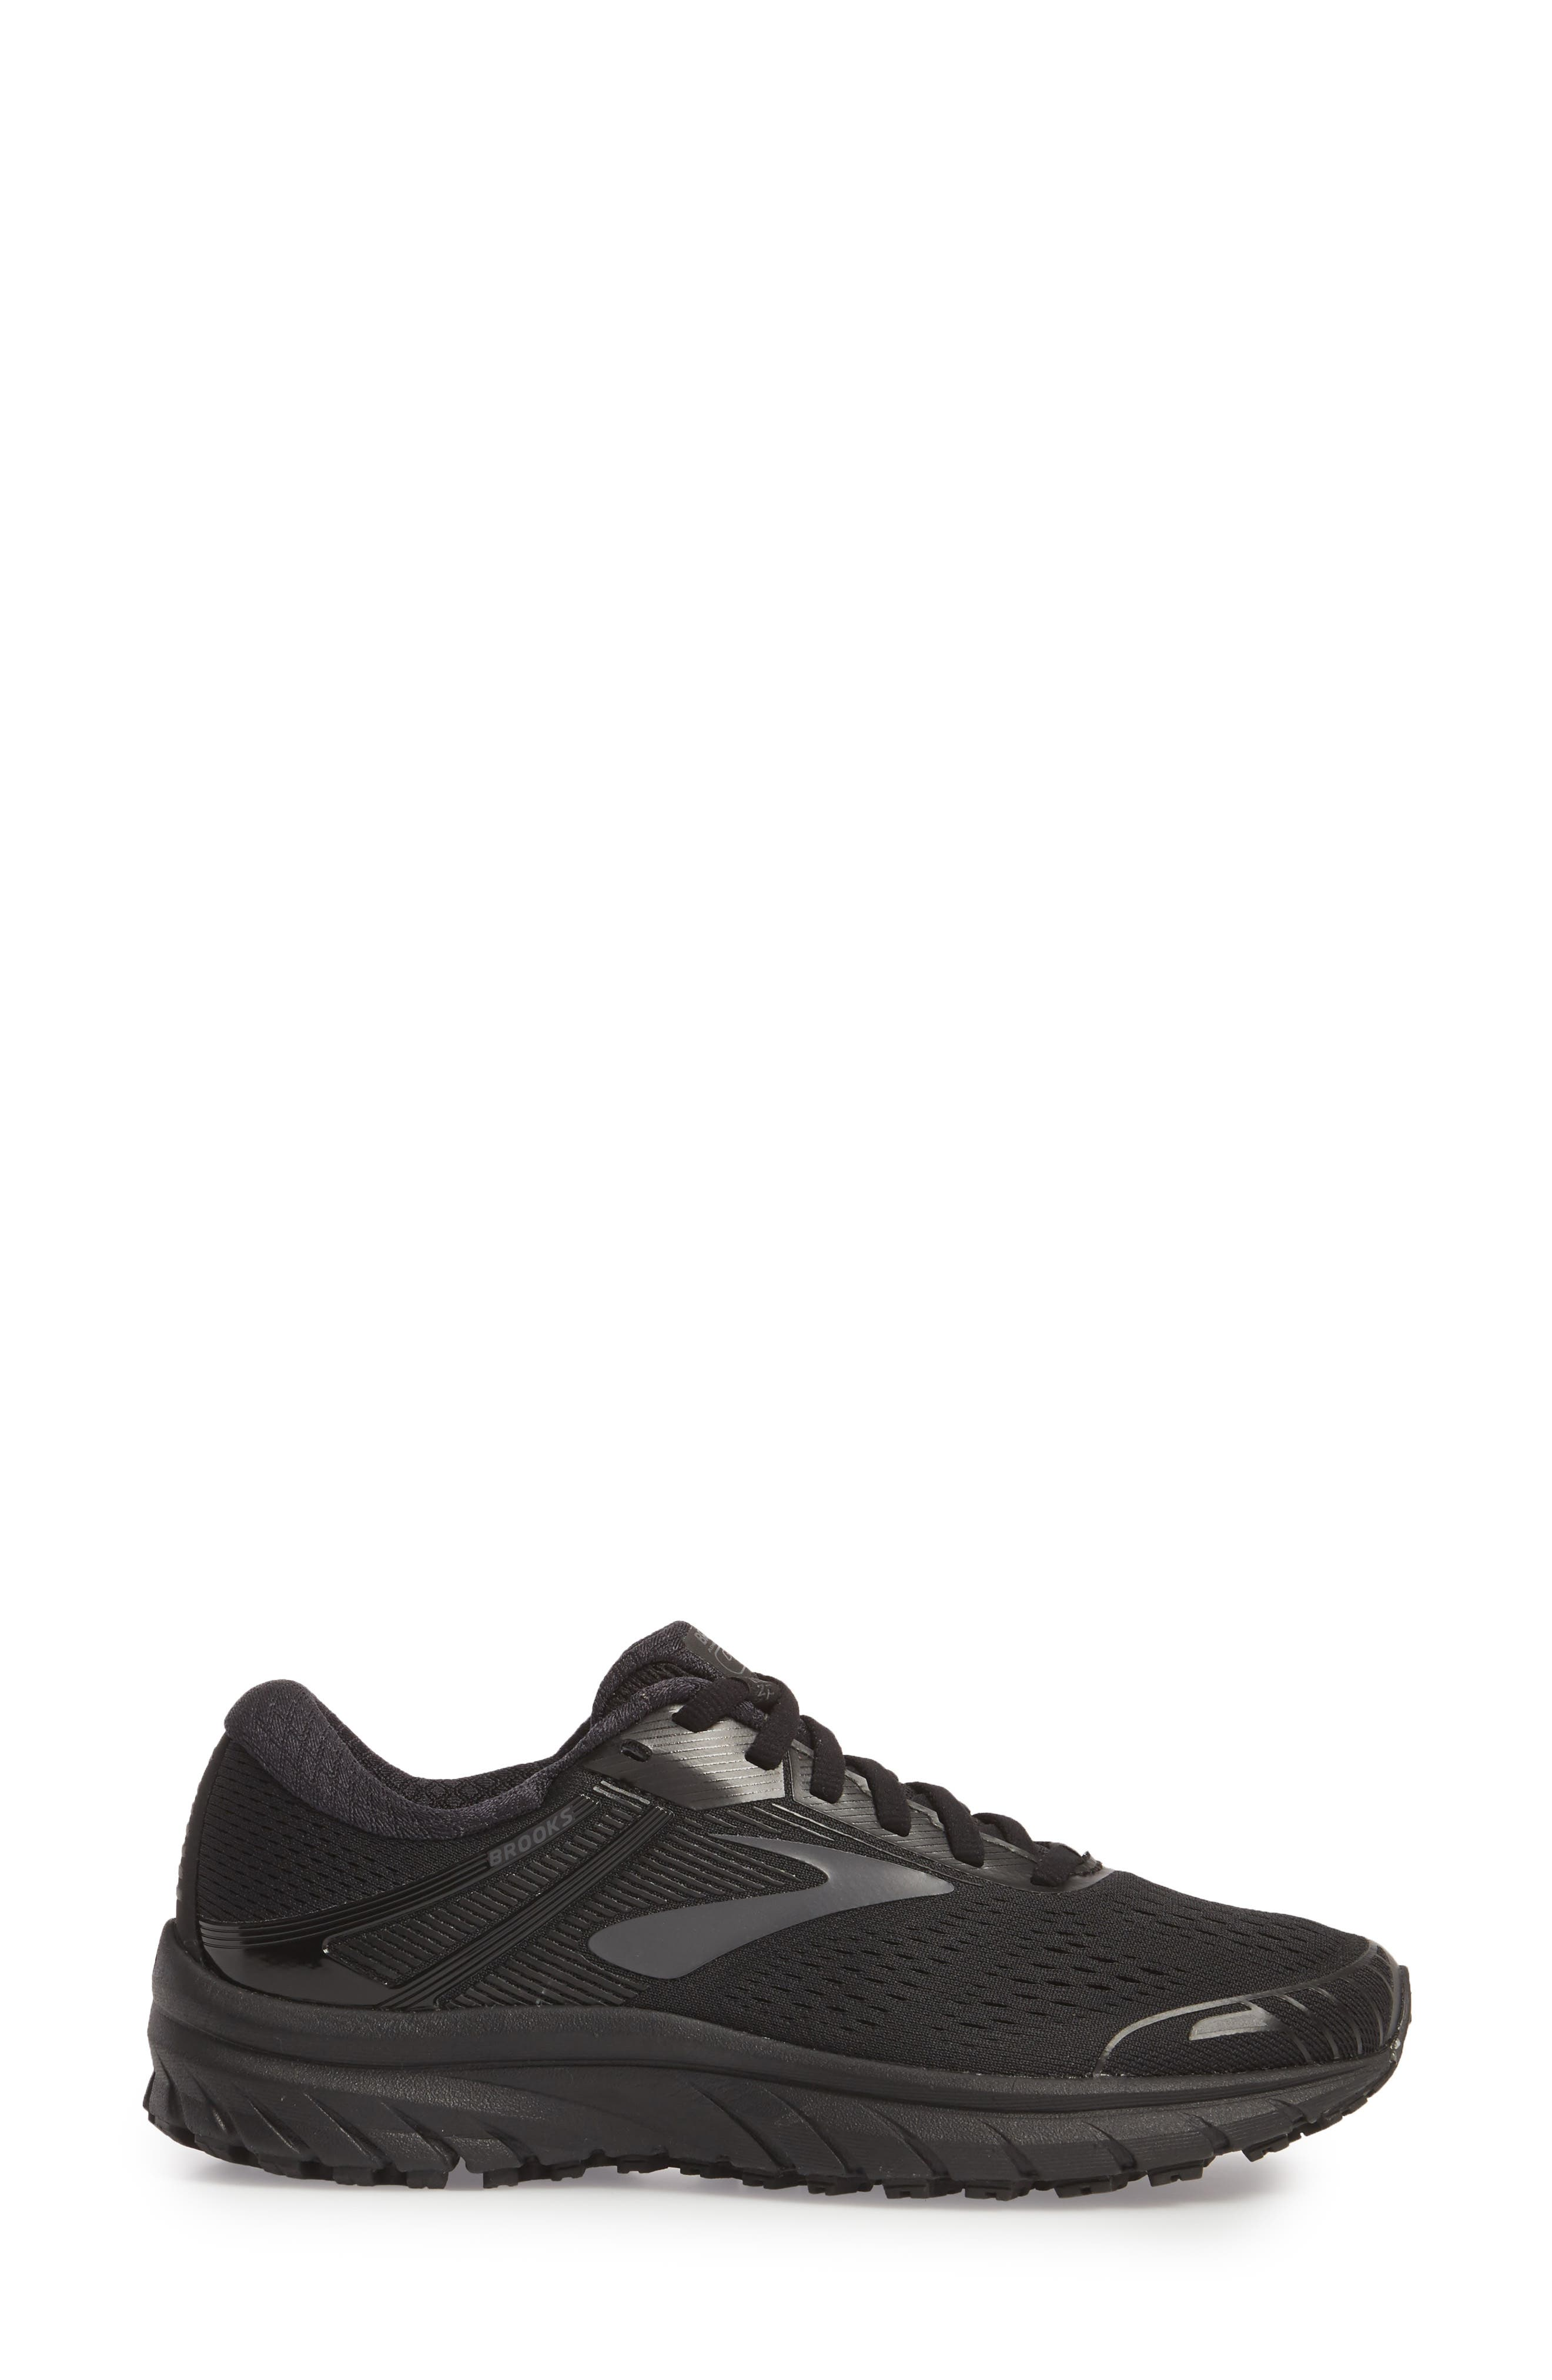 Adrenaline GTS 18 Running Shoe,                             Alternate thumbnail 3, color,                             BLACK/ BLACK